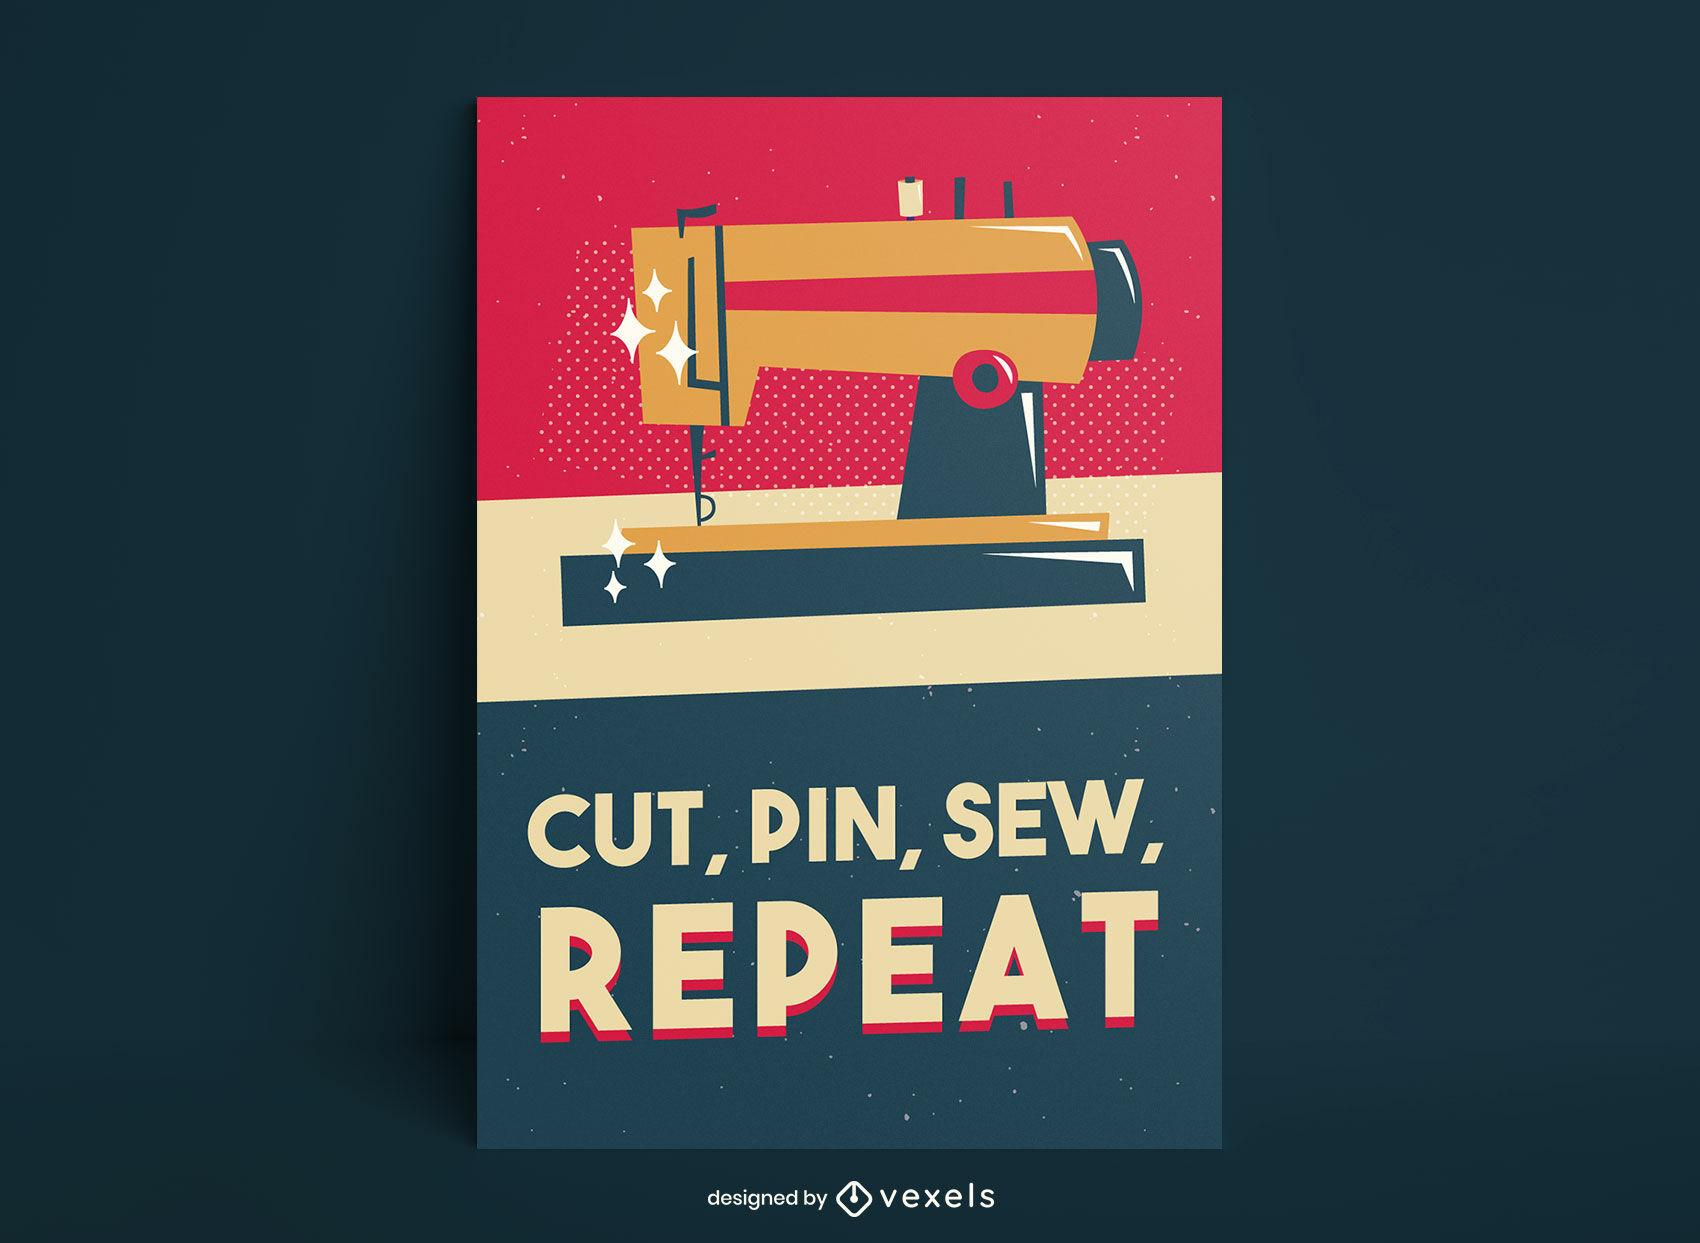 Sewing machine shiny retro poster design